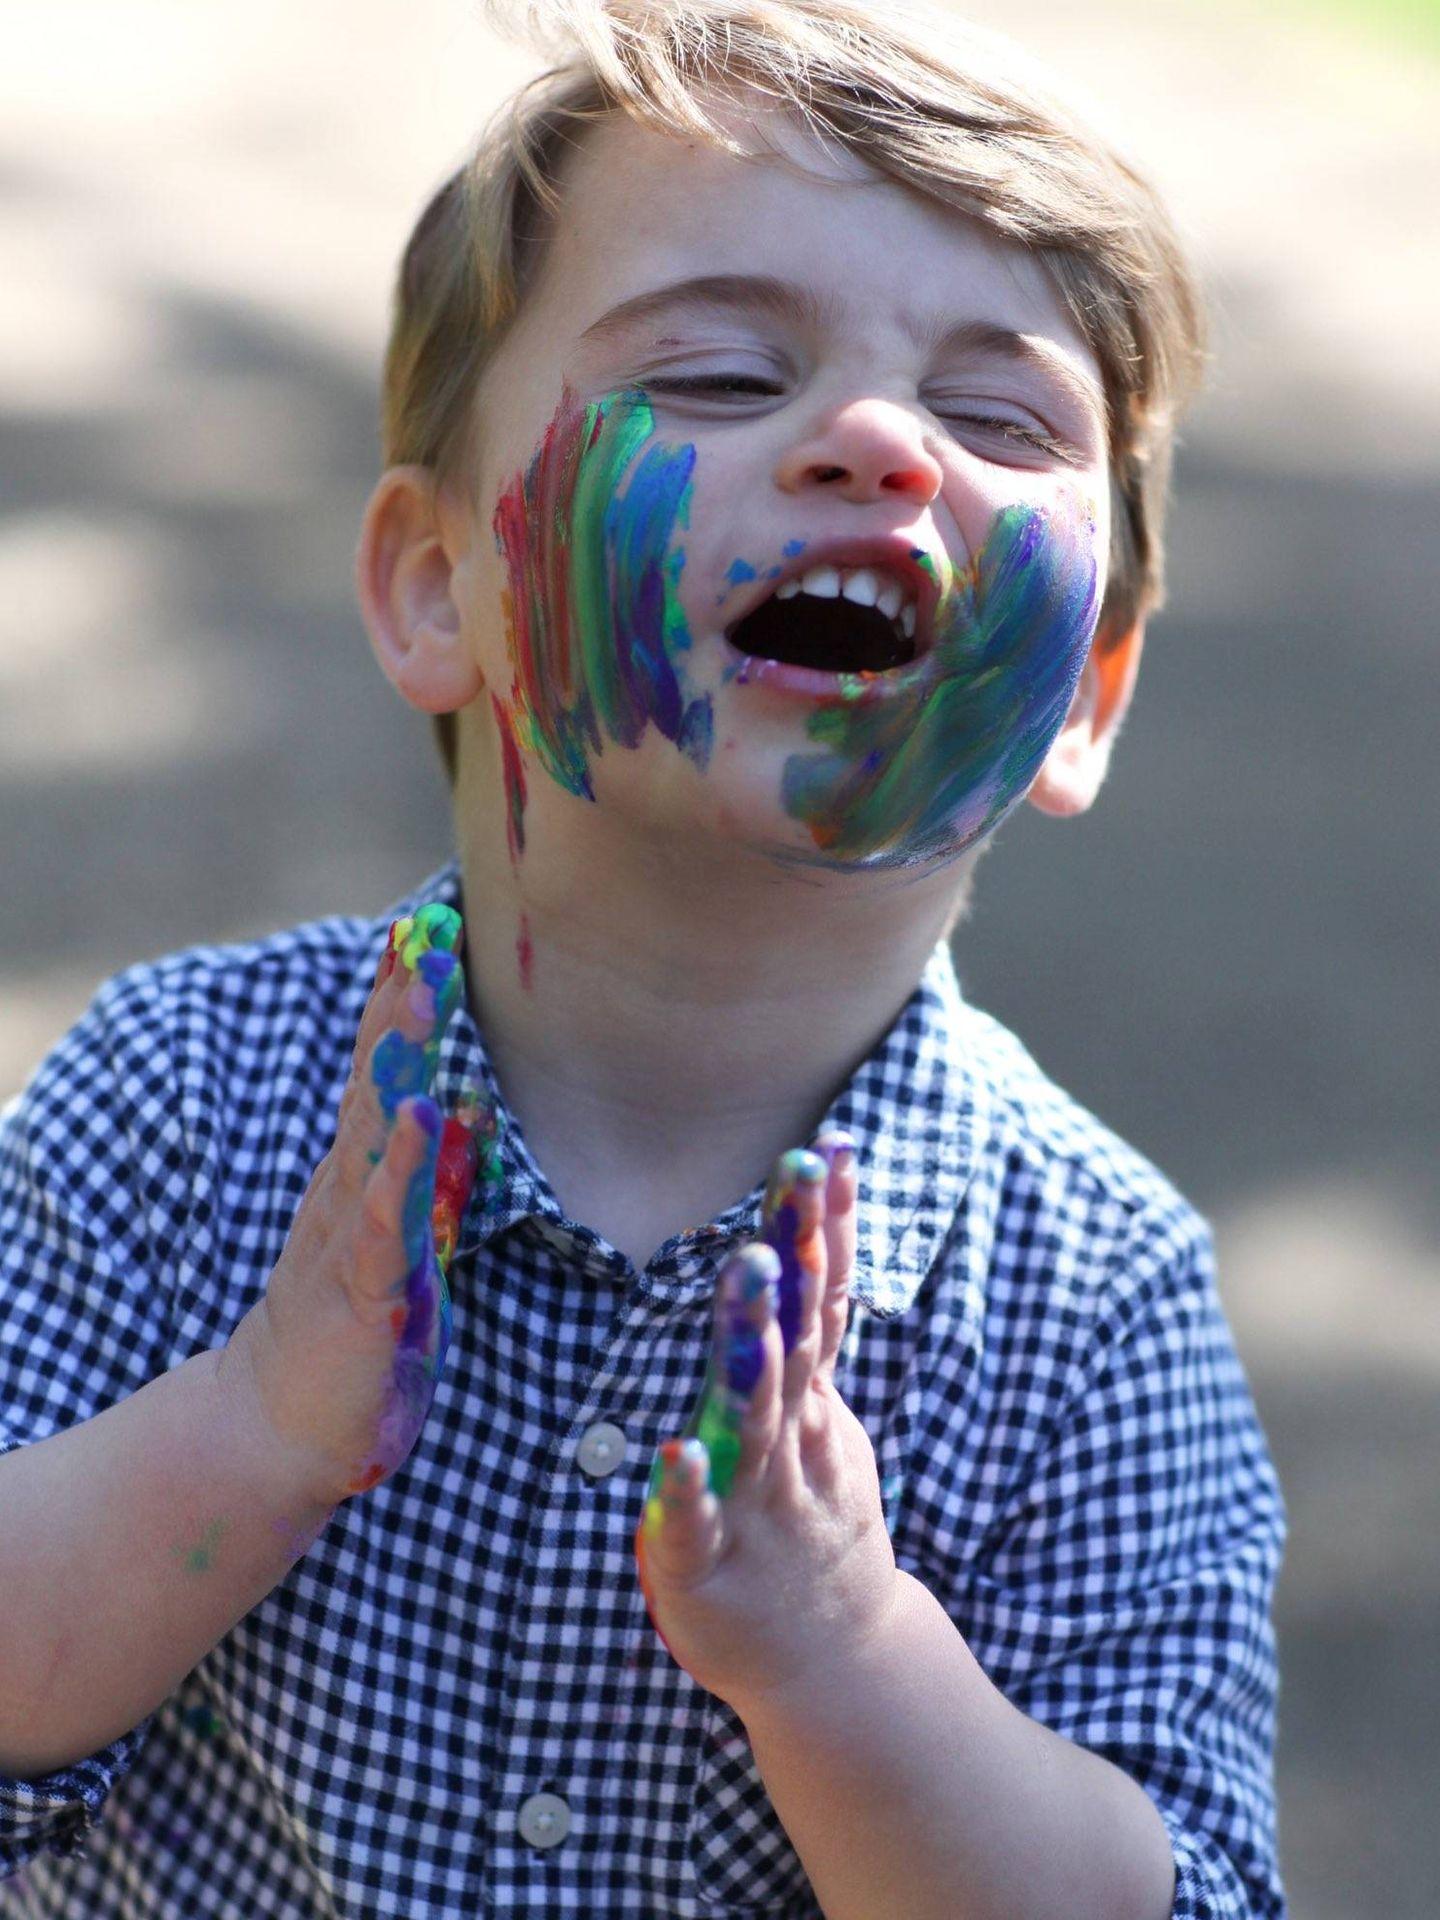 Louis de Cambridge, para su cumpleaños. (Kate Middleton / Kensington Palace)